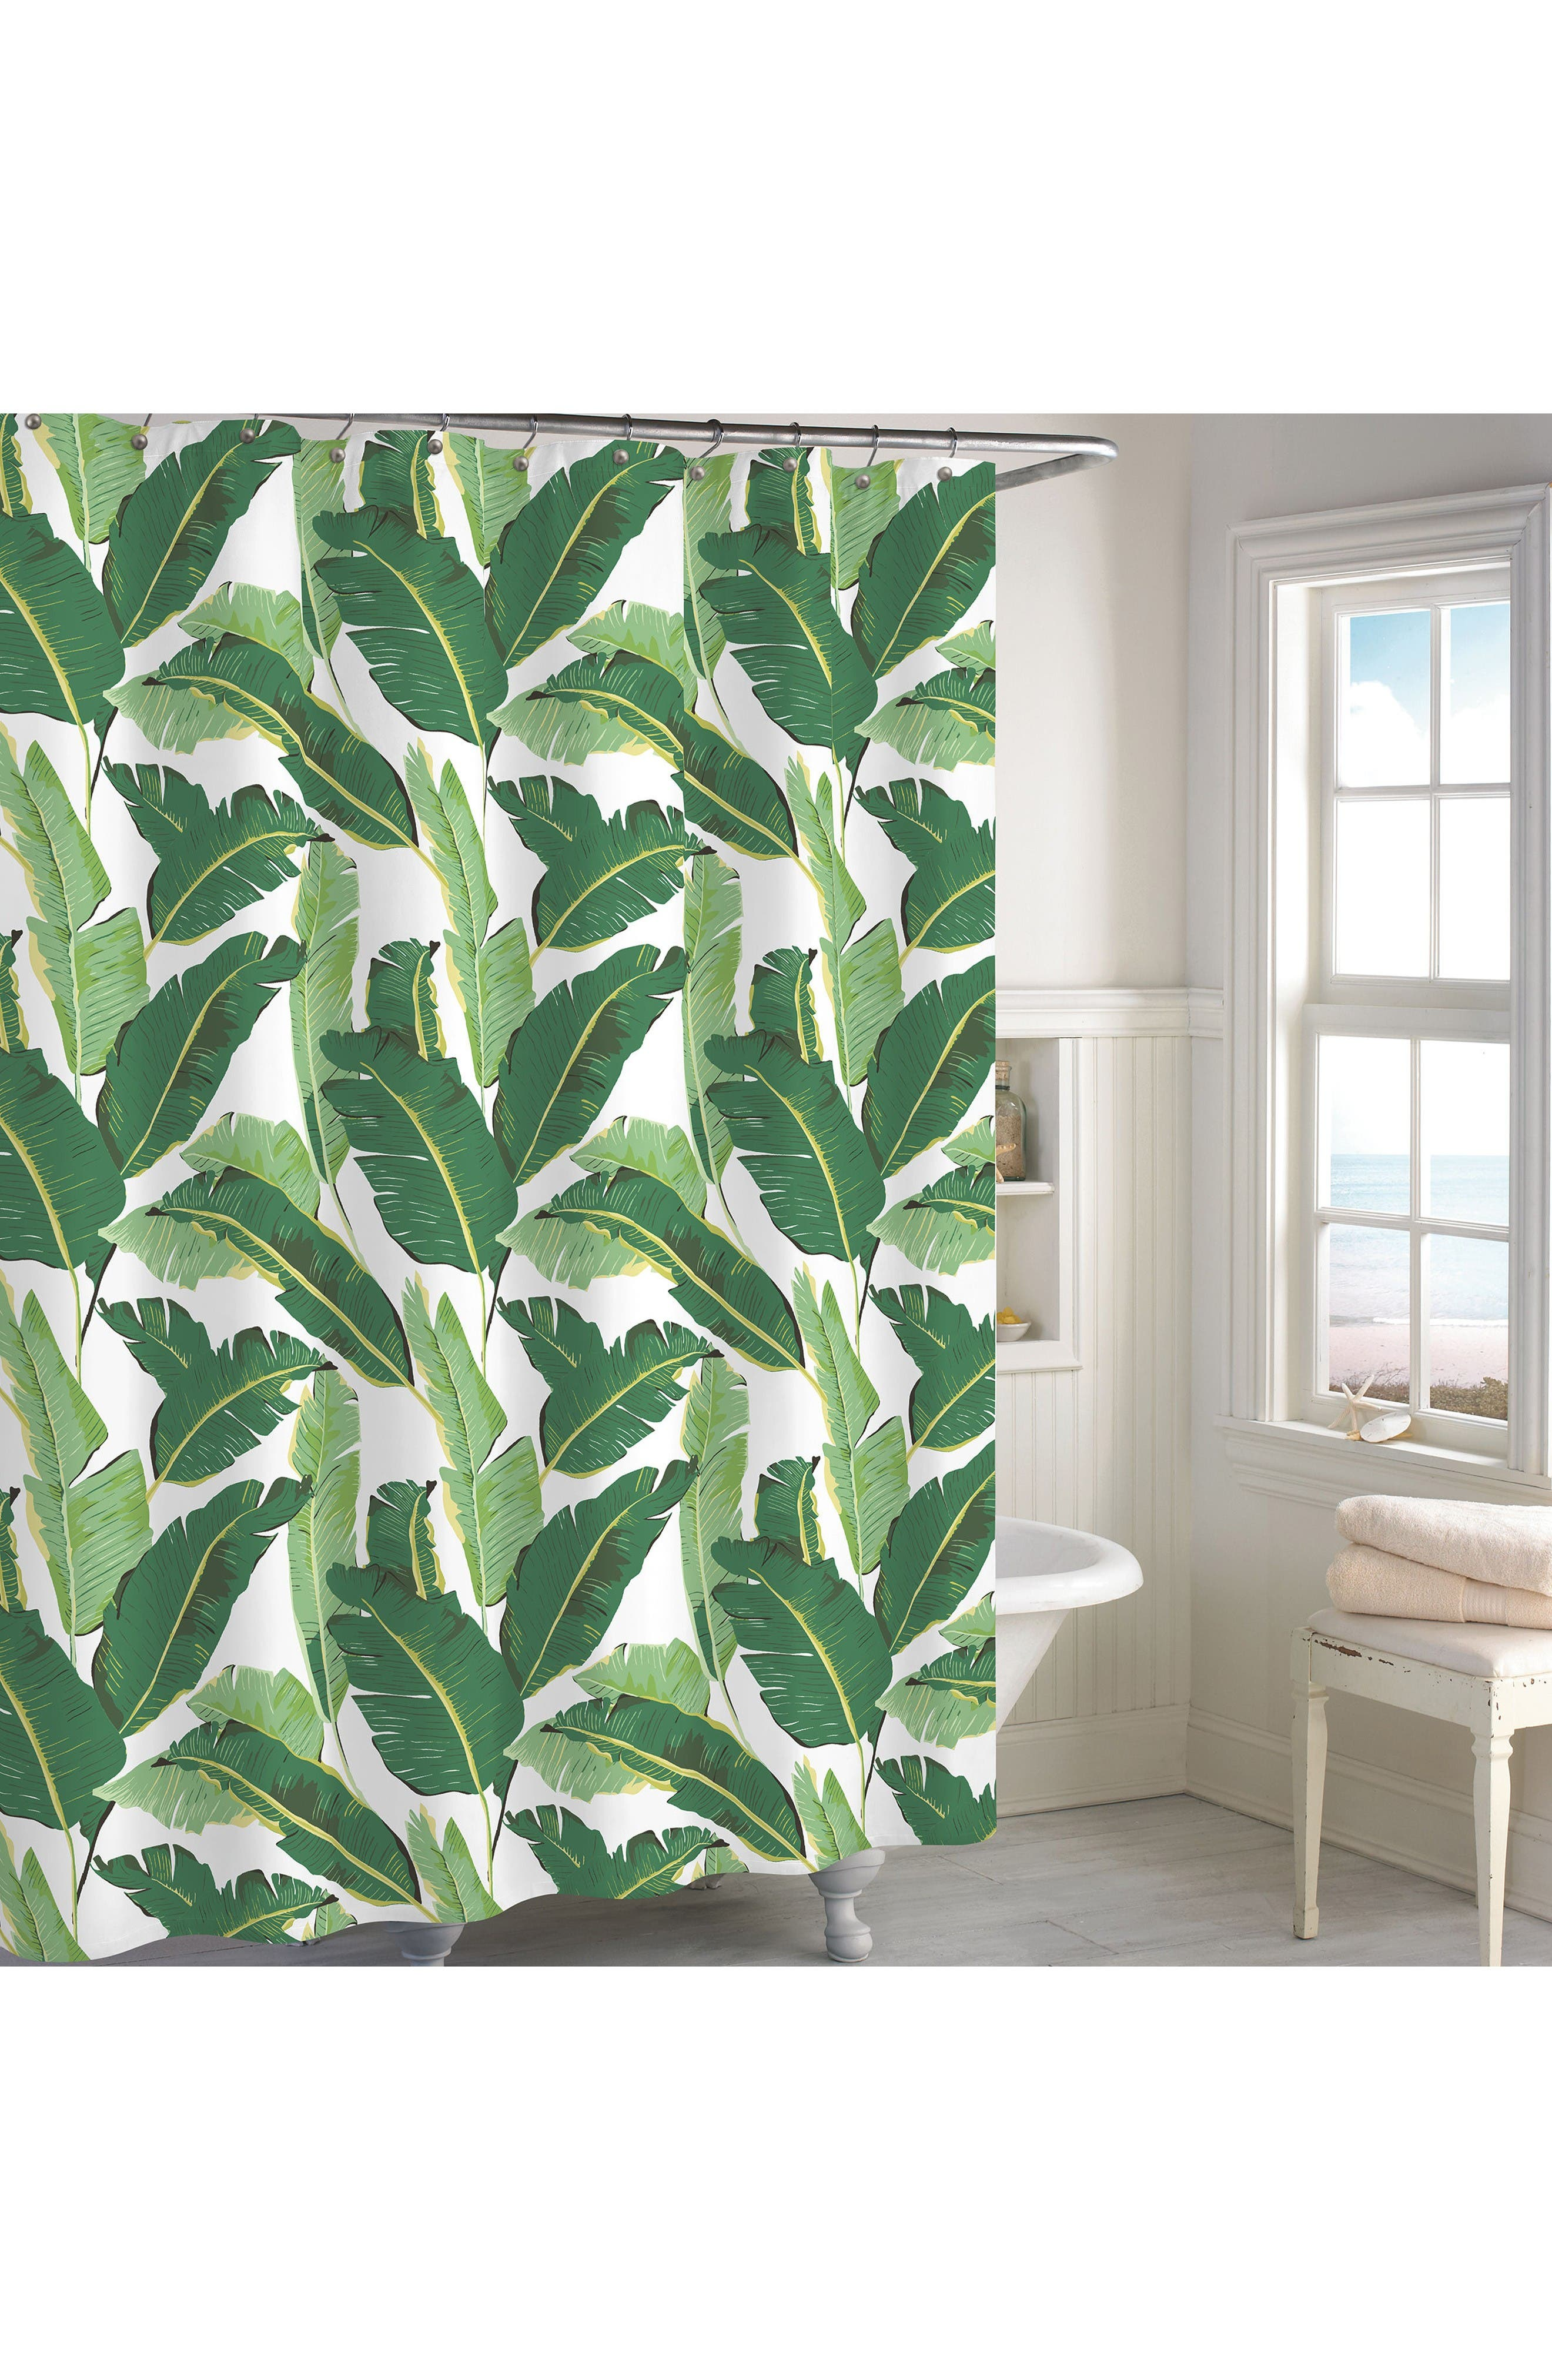 Shower Curtains Nordstrom - Burgundy shower curtain sets